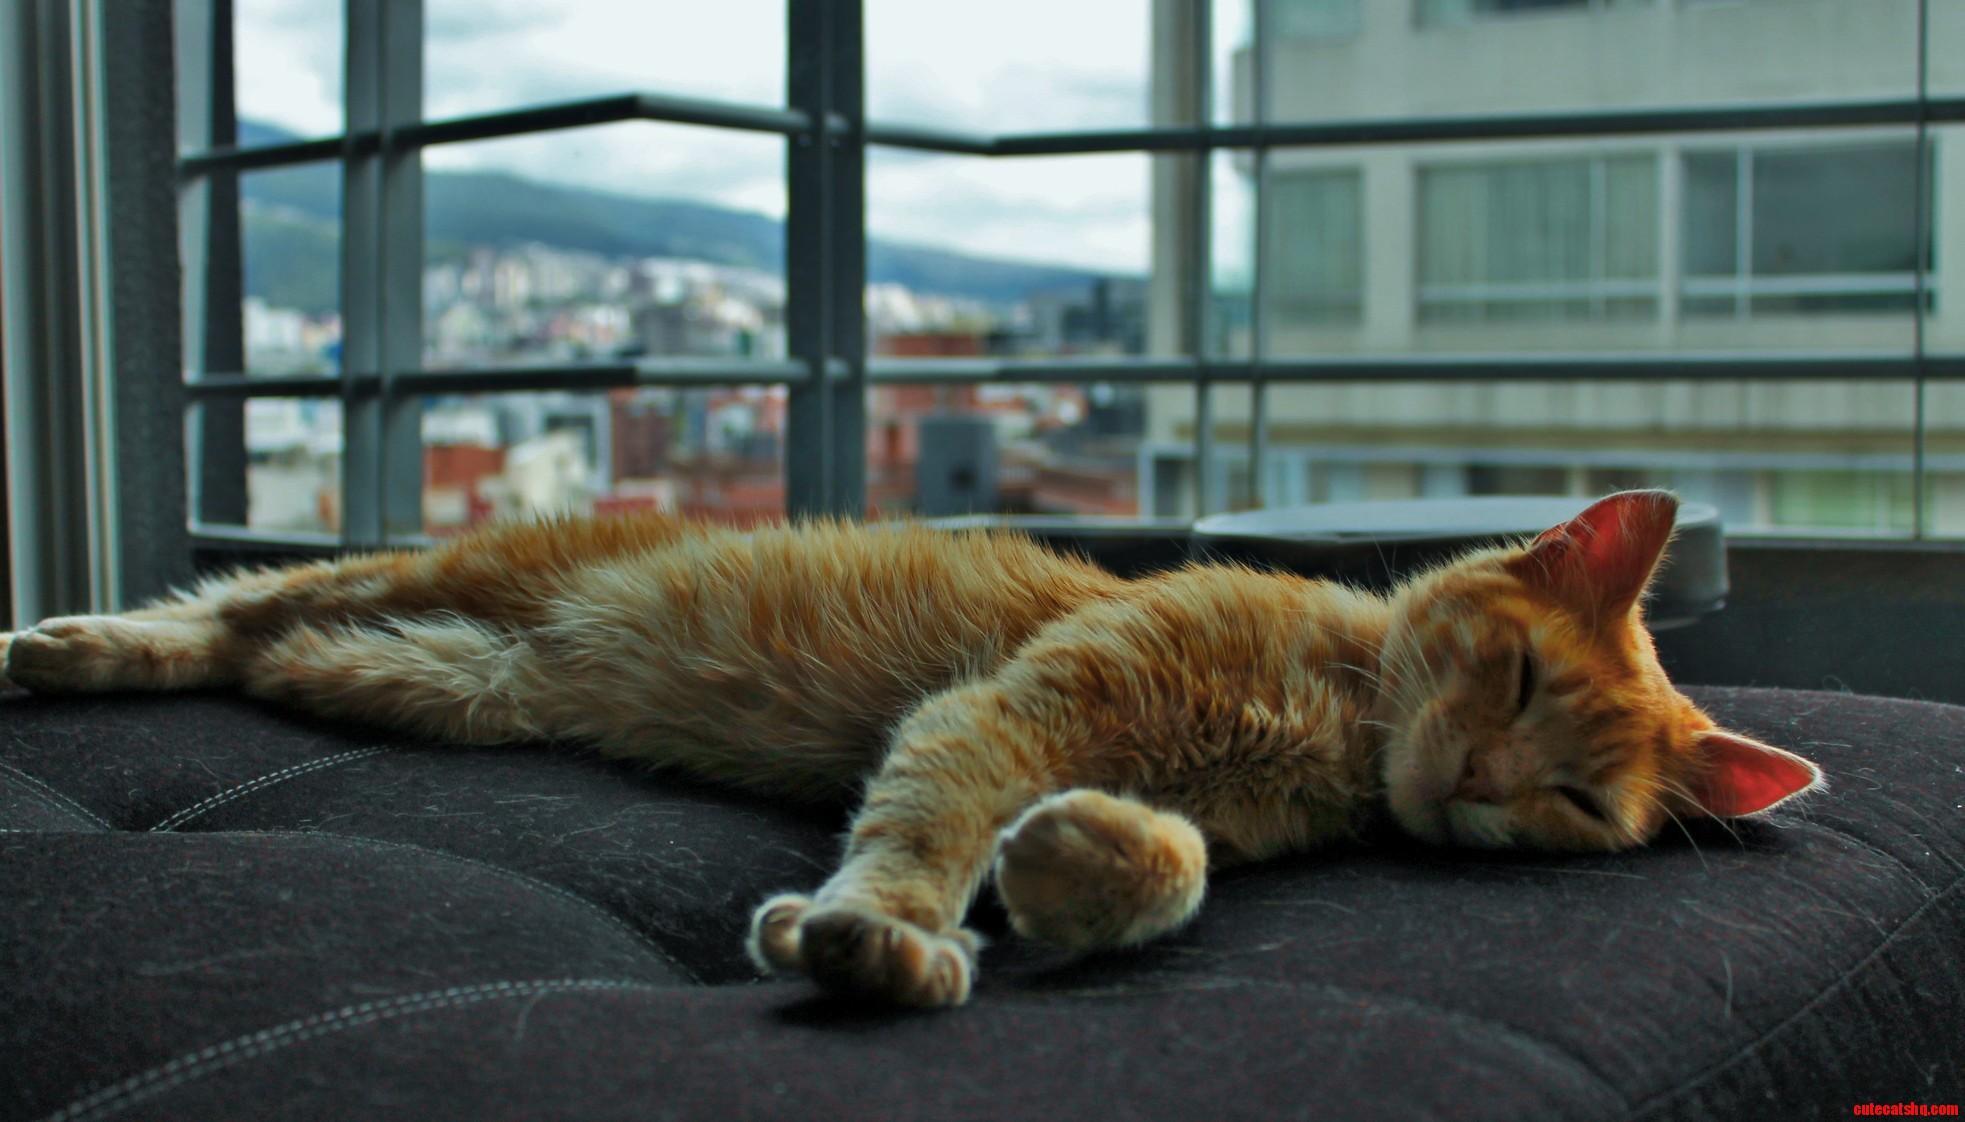 My brand new ecuadorian kitty kneads in his sleep